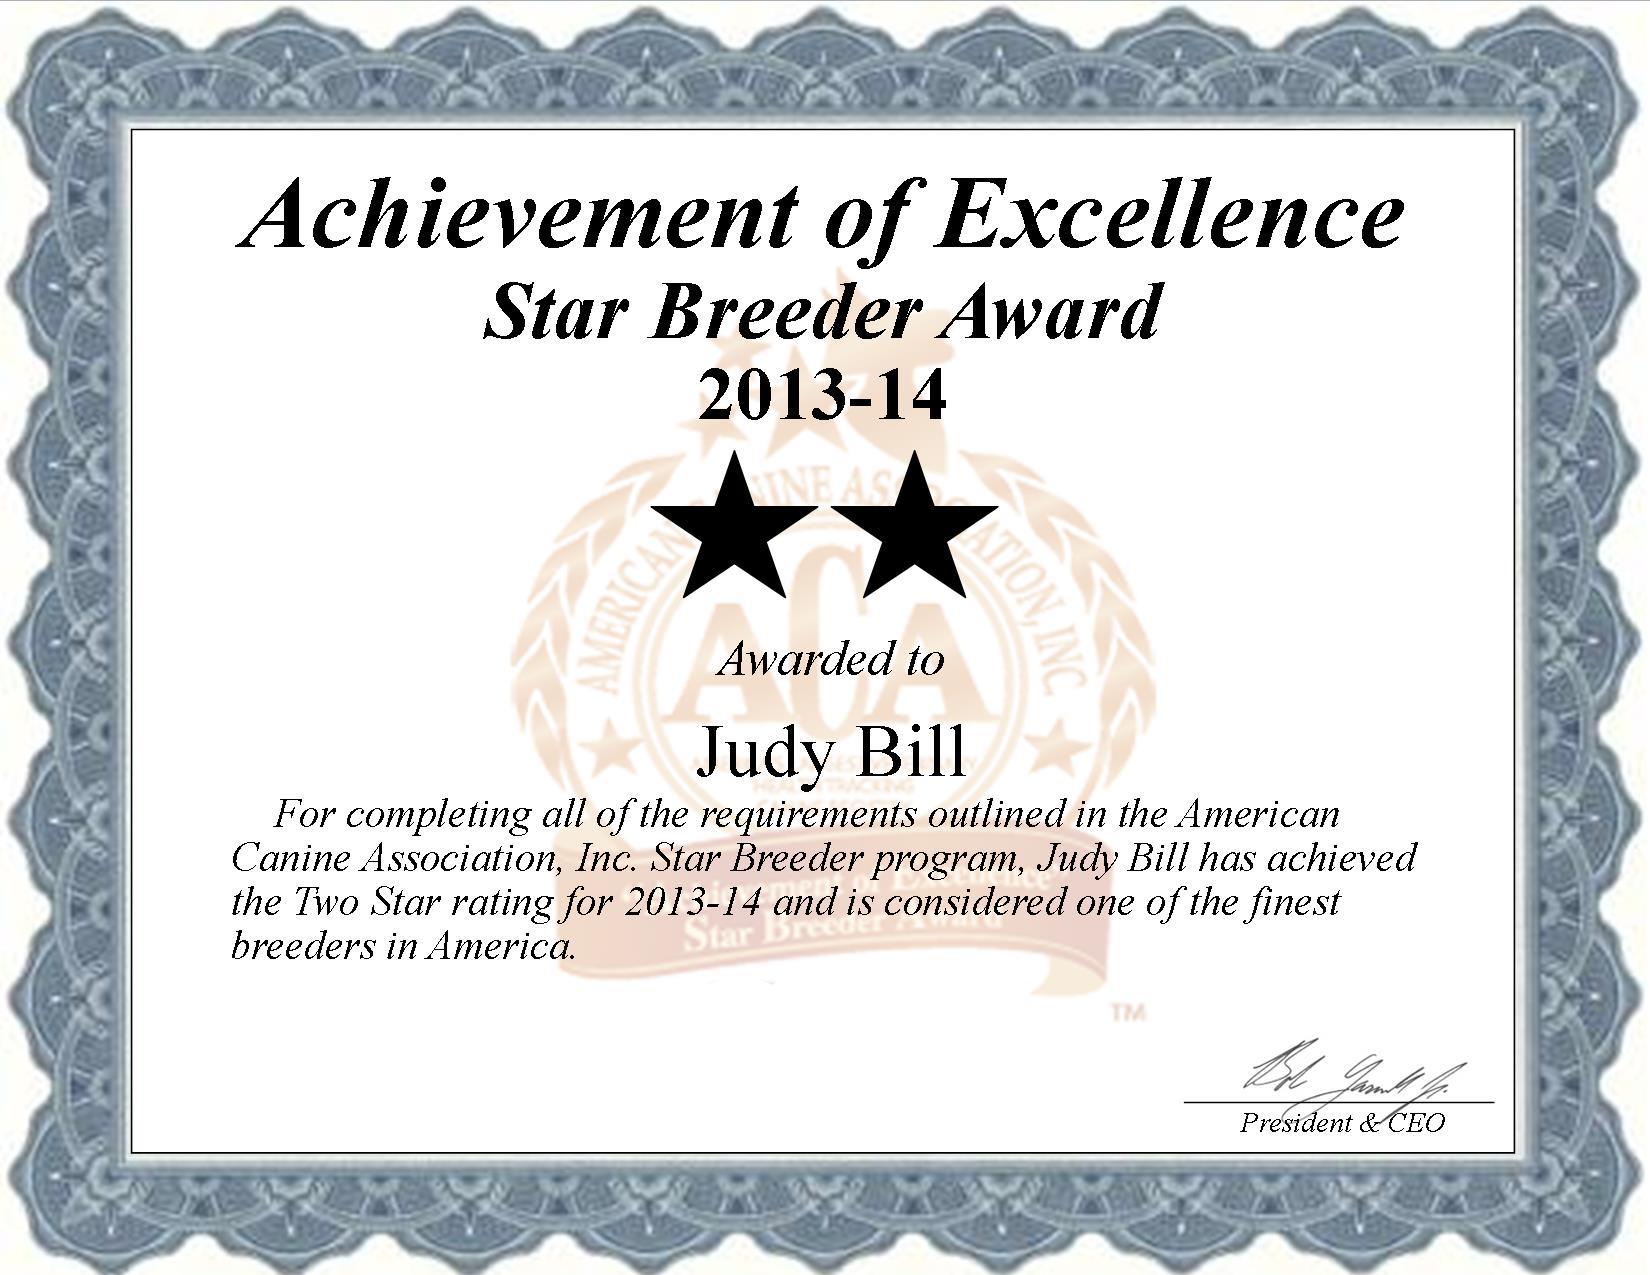 Judy Bill, Judy, Bill, Bill kennel, Judy Bill breeder, Antlers, OK, Oklahoma, Antlers OK, breeder, star breeder, 5 star breeders,  starbreeder, starbreeders, 2 star, dog,  puppy, puppies